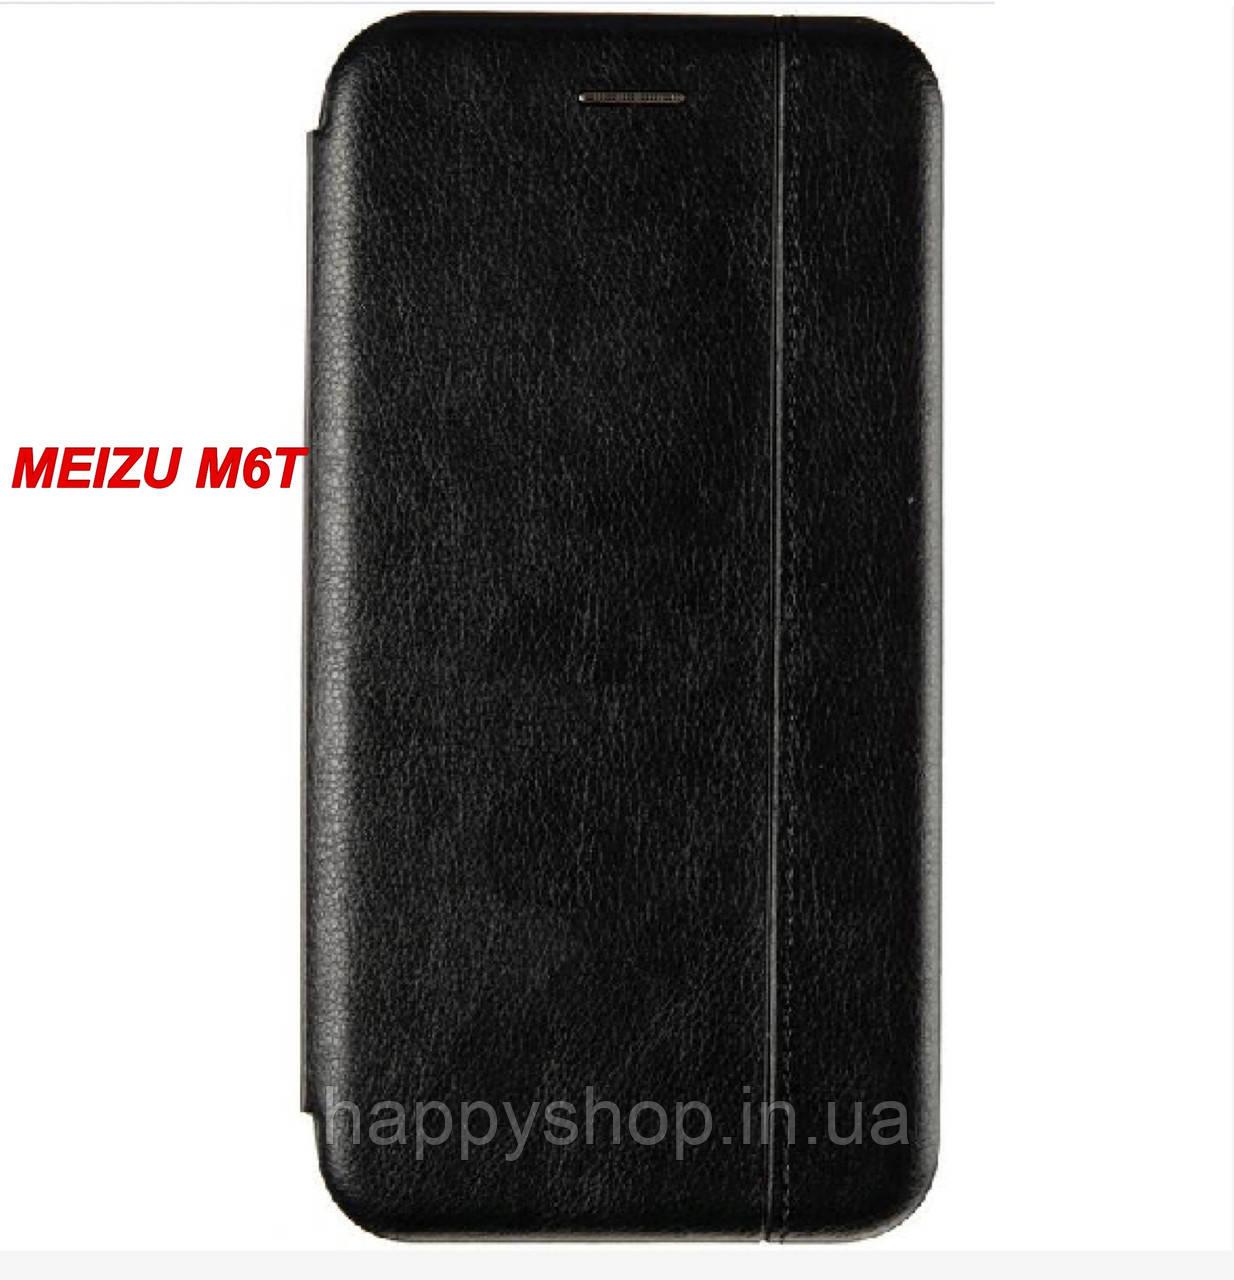 Чохол-книжка Gelius Leather для Meizu M6t (Чорний)